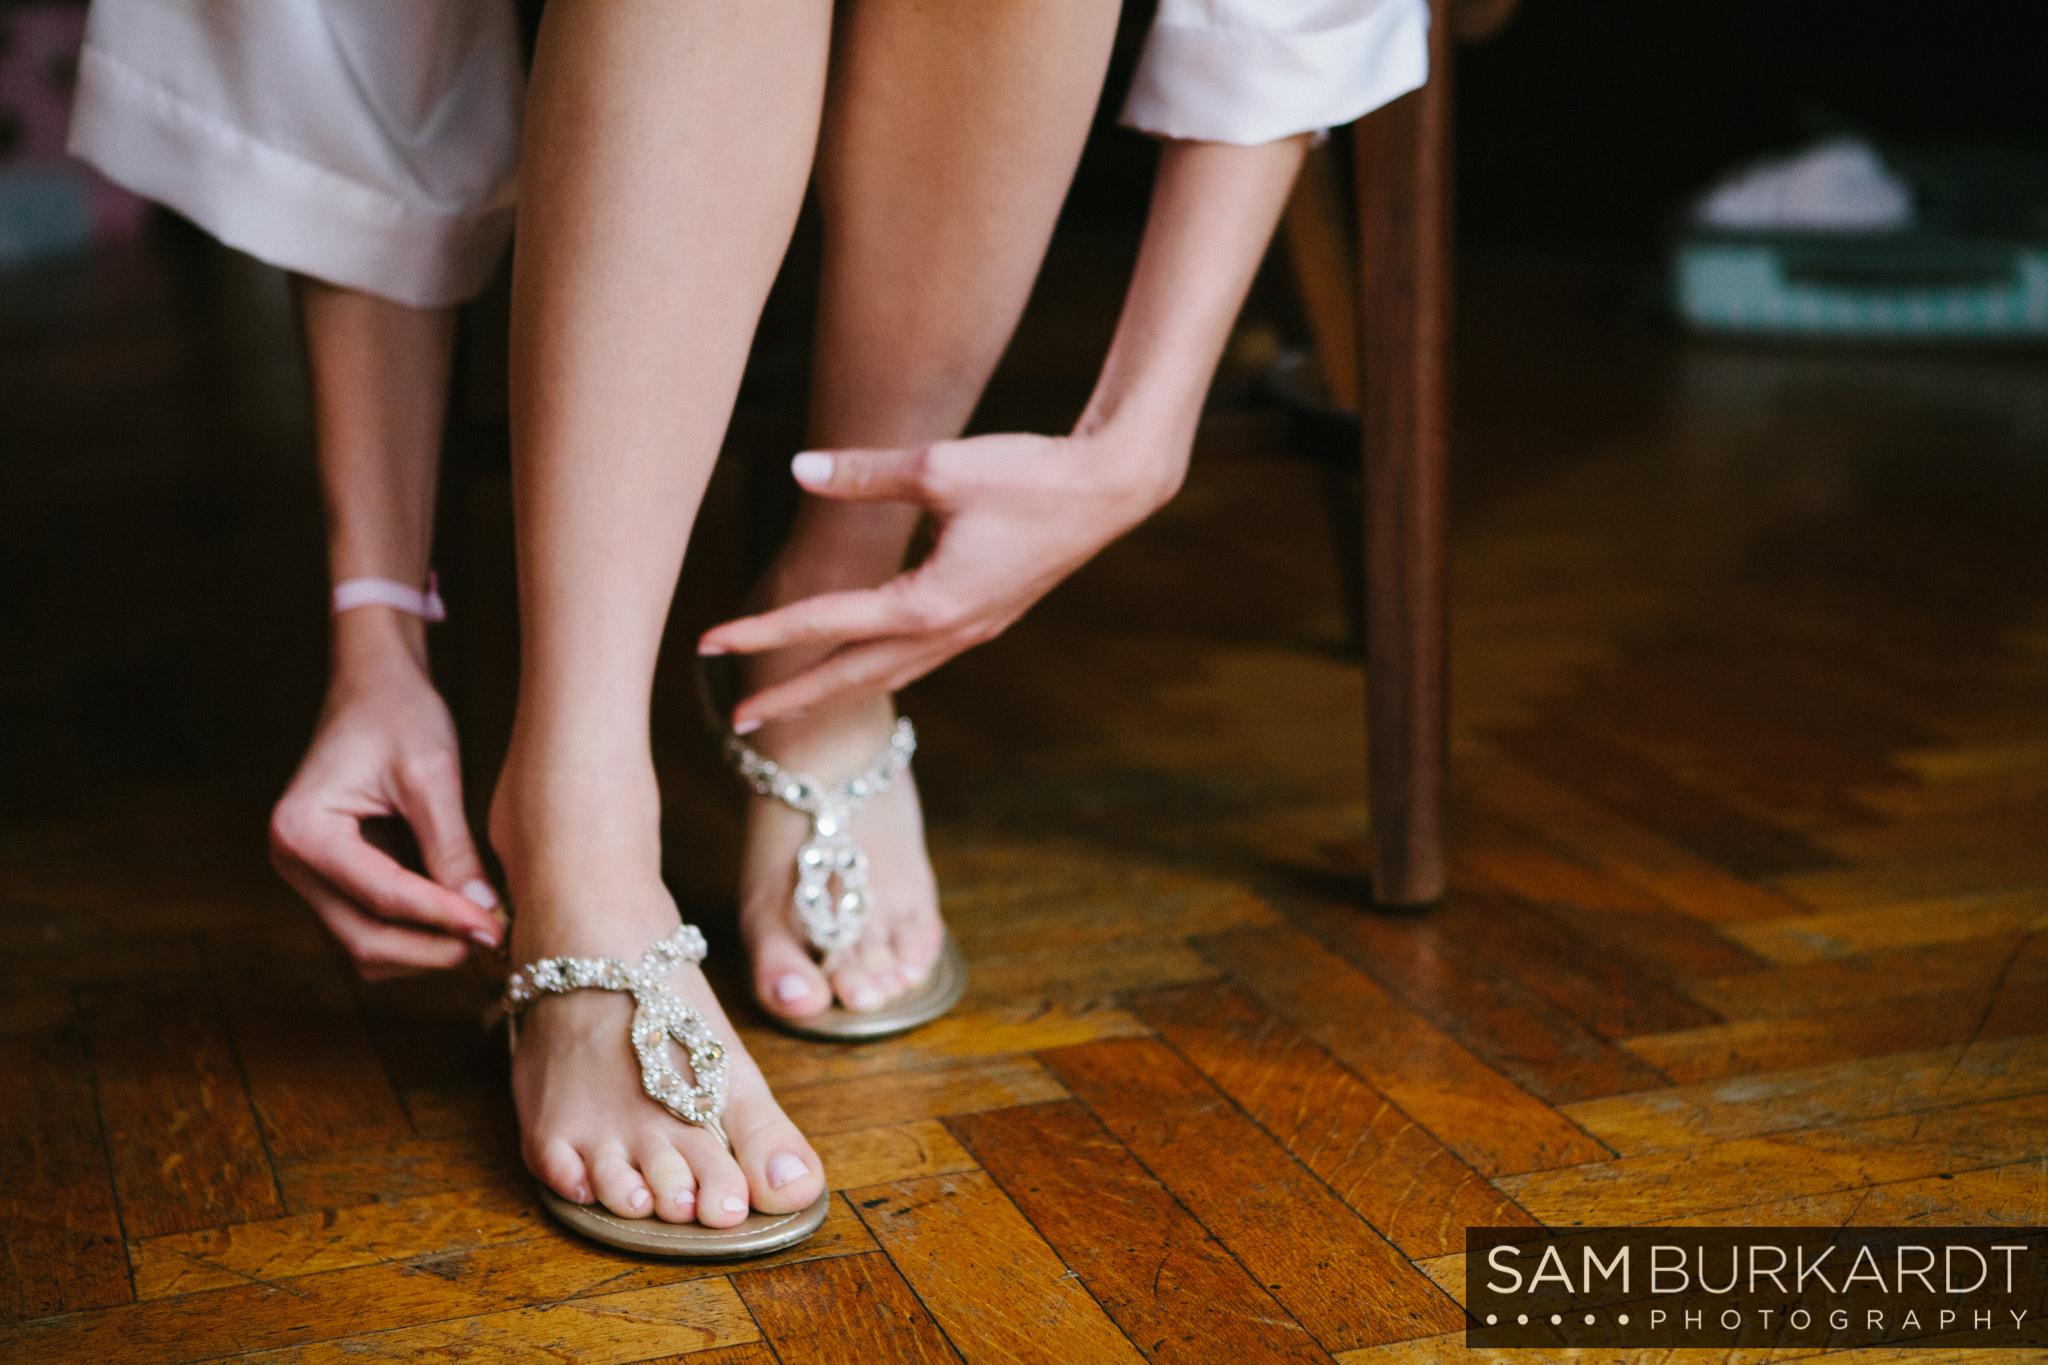 samburkardt_platz_moore_connecticut_branford_house_long_island_sound_august_photography_wedding_glamour_pink_0010.jpg